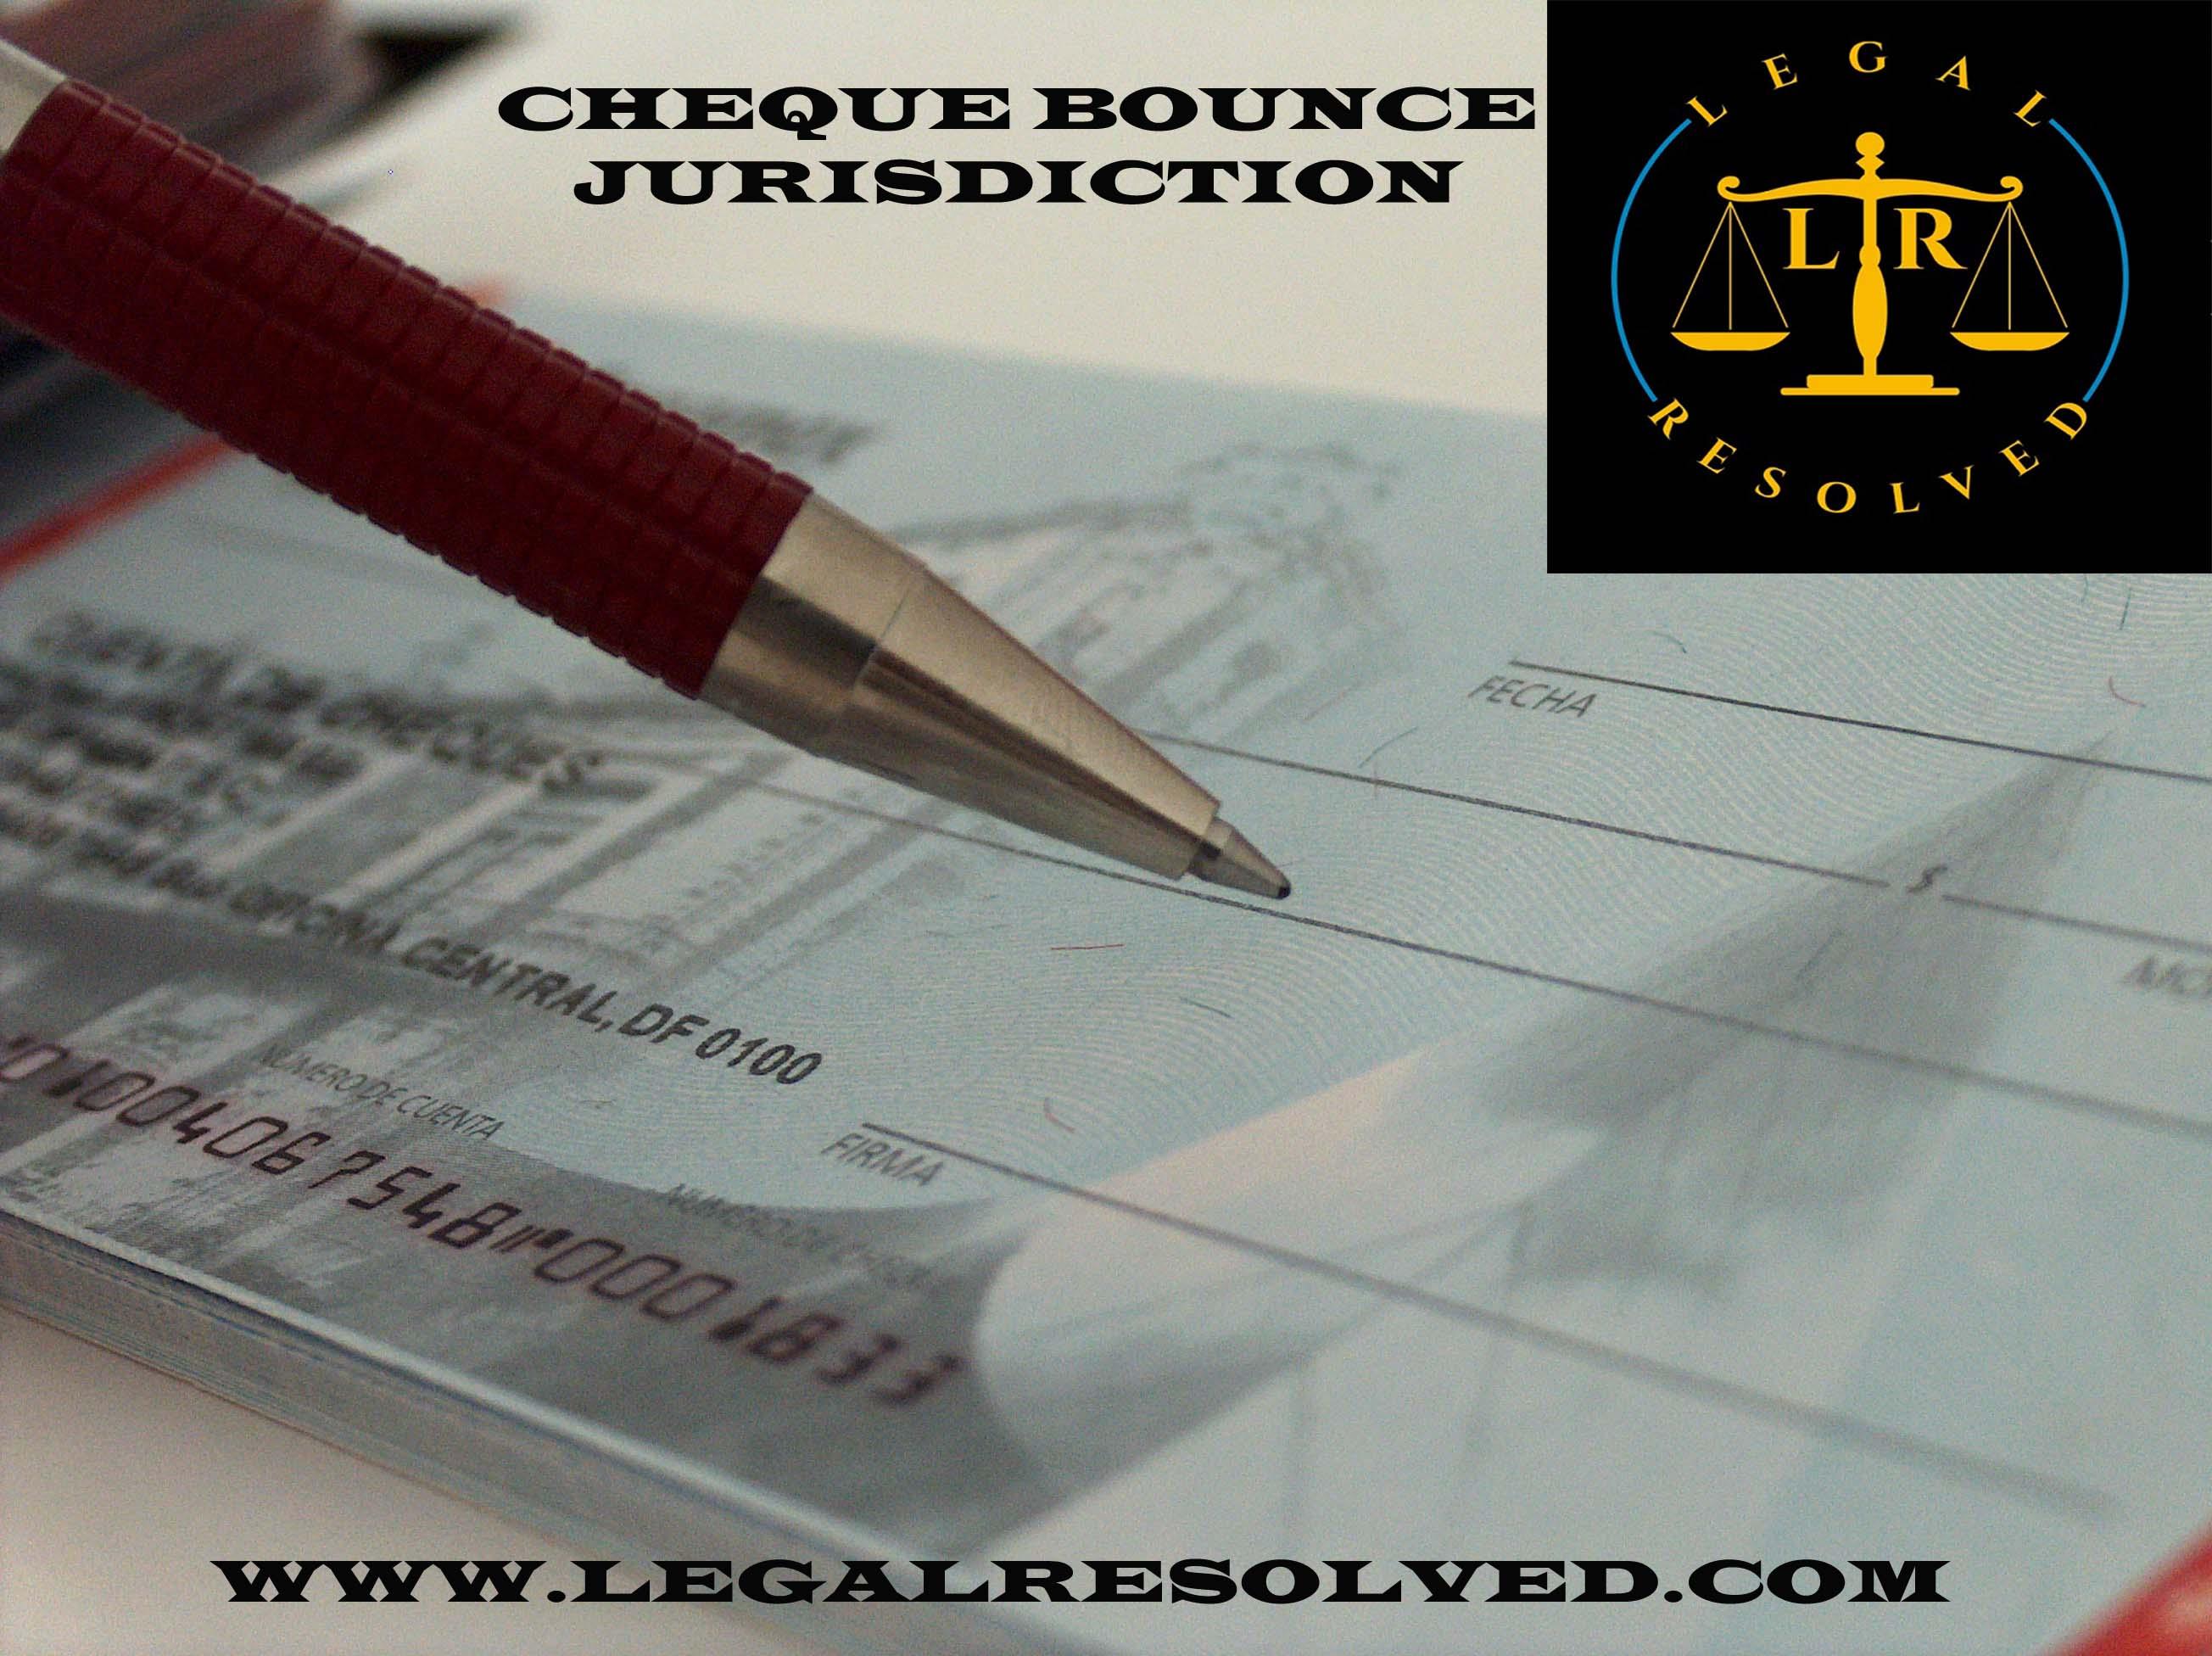 Cheque bounce jurisdiction